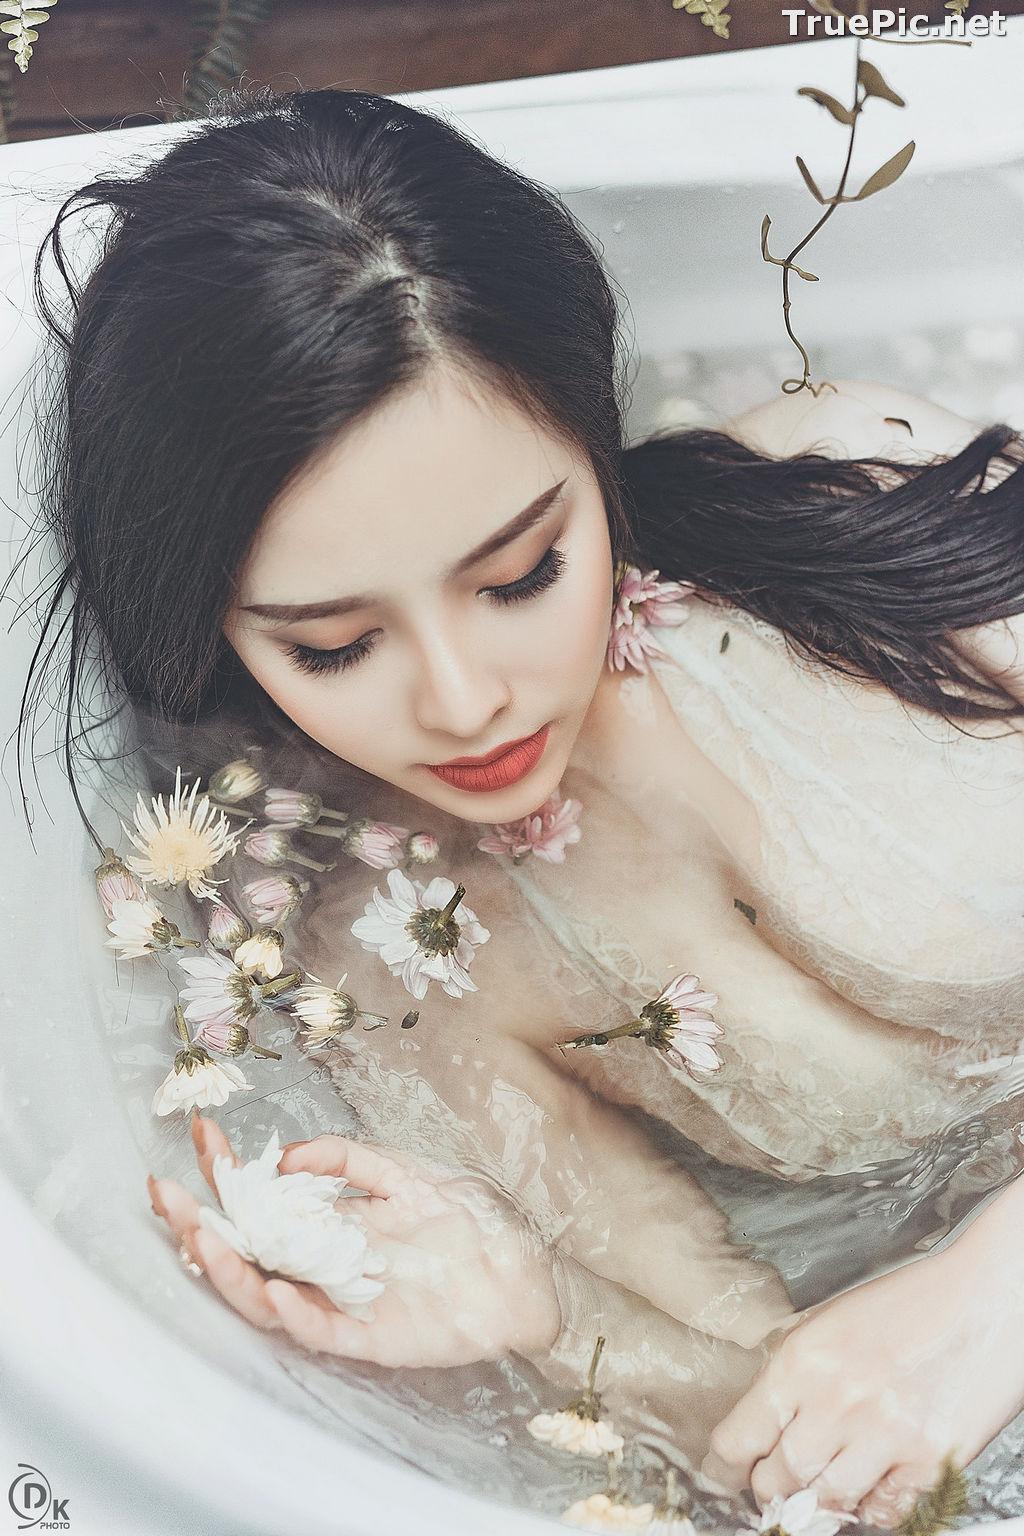 Image Vietnamese Model - Beautiful Fairy Flower In The Bath - TruePic.net - Picture-6